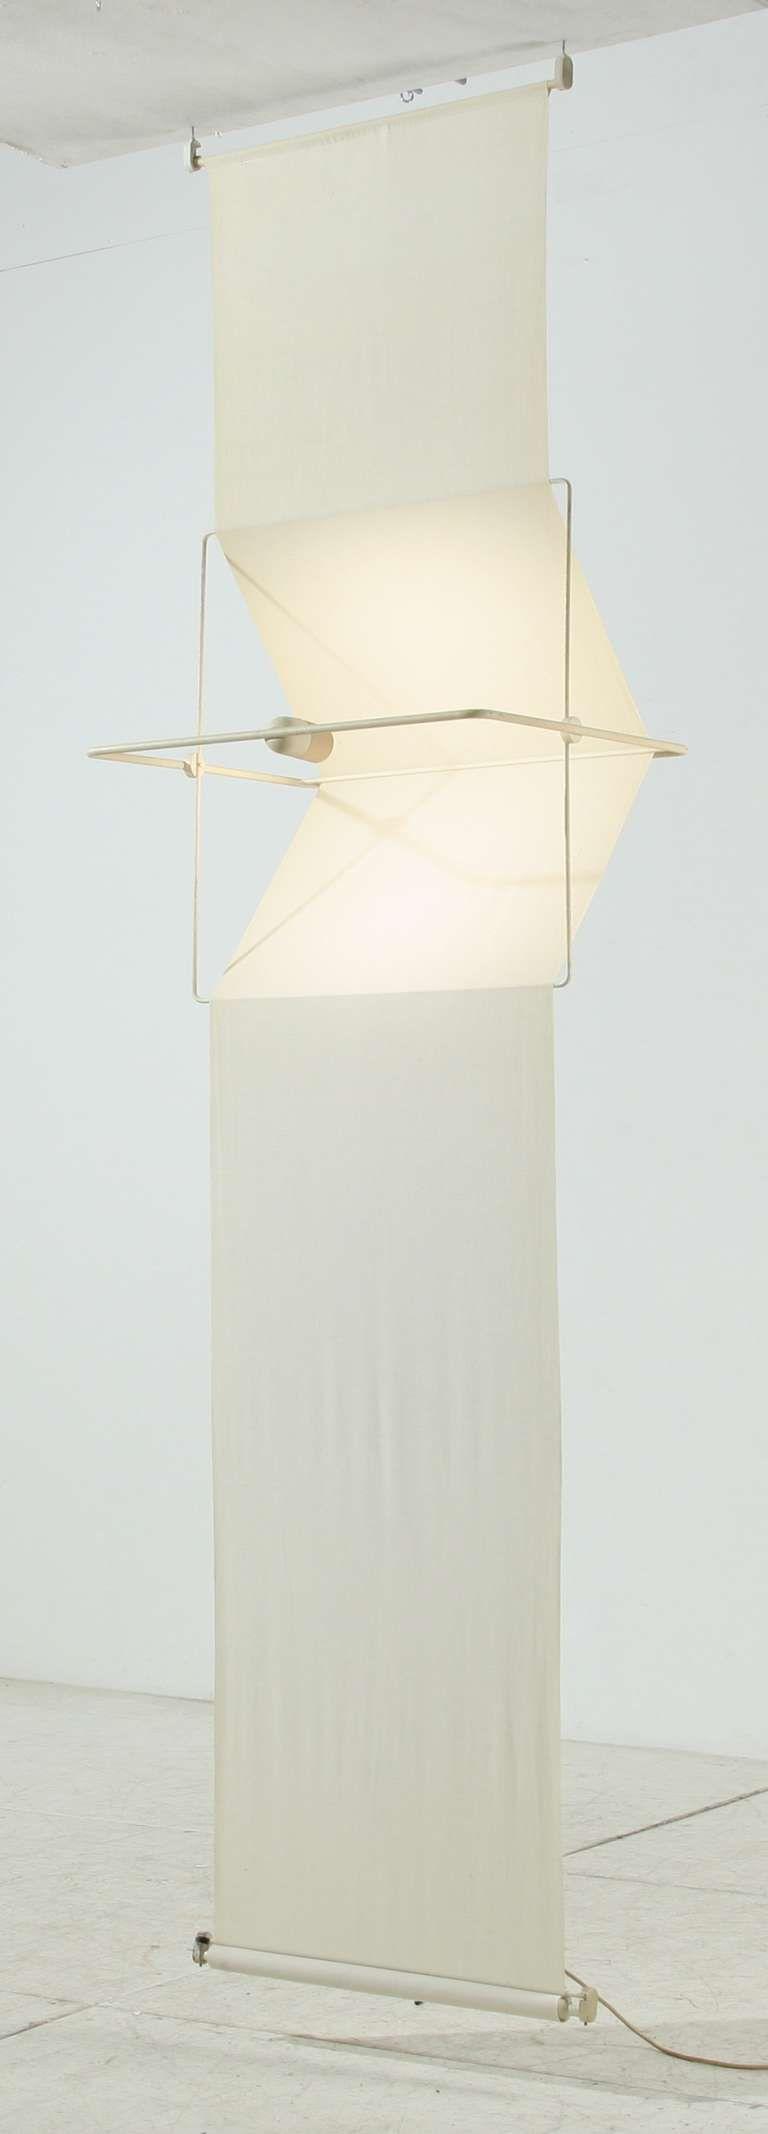 Rare 'Quinta' Lamp and Room Divider by Silvio Coppola, Artemide, Italy, 1970s